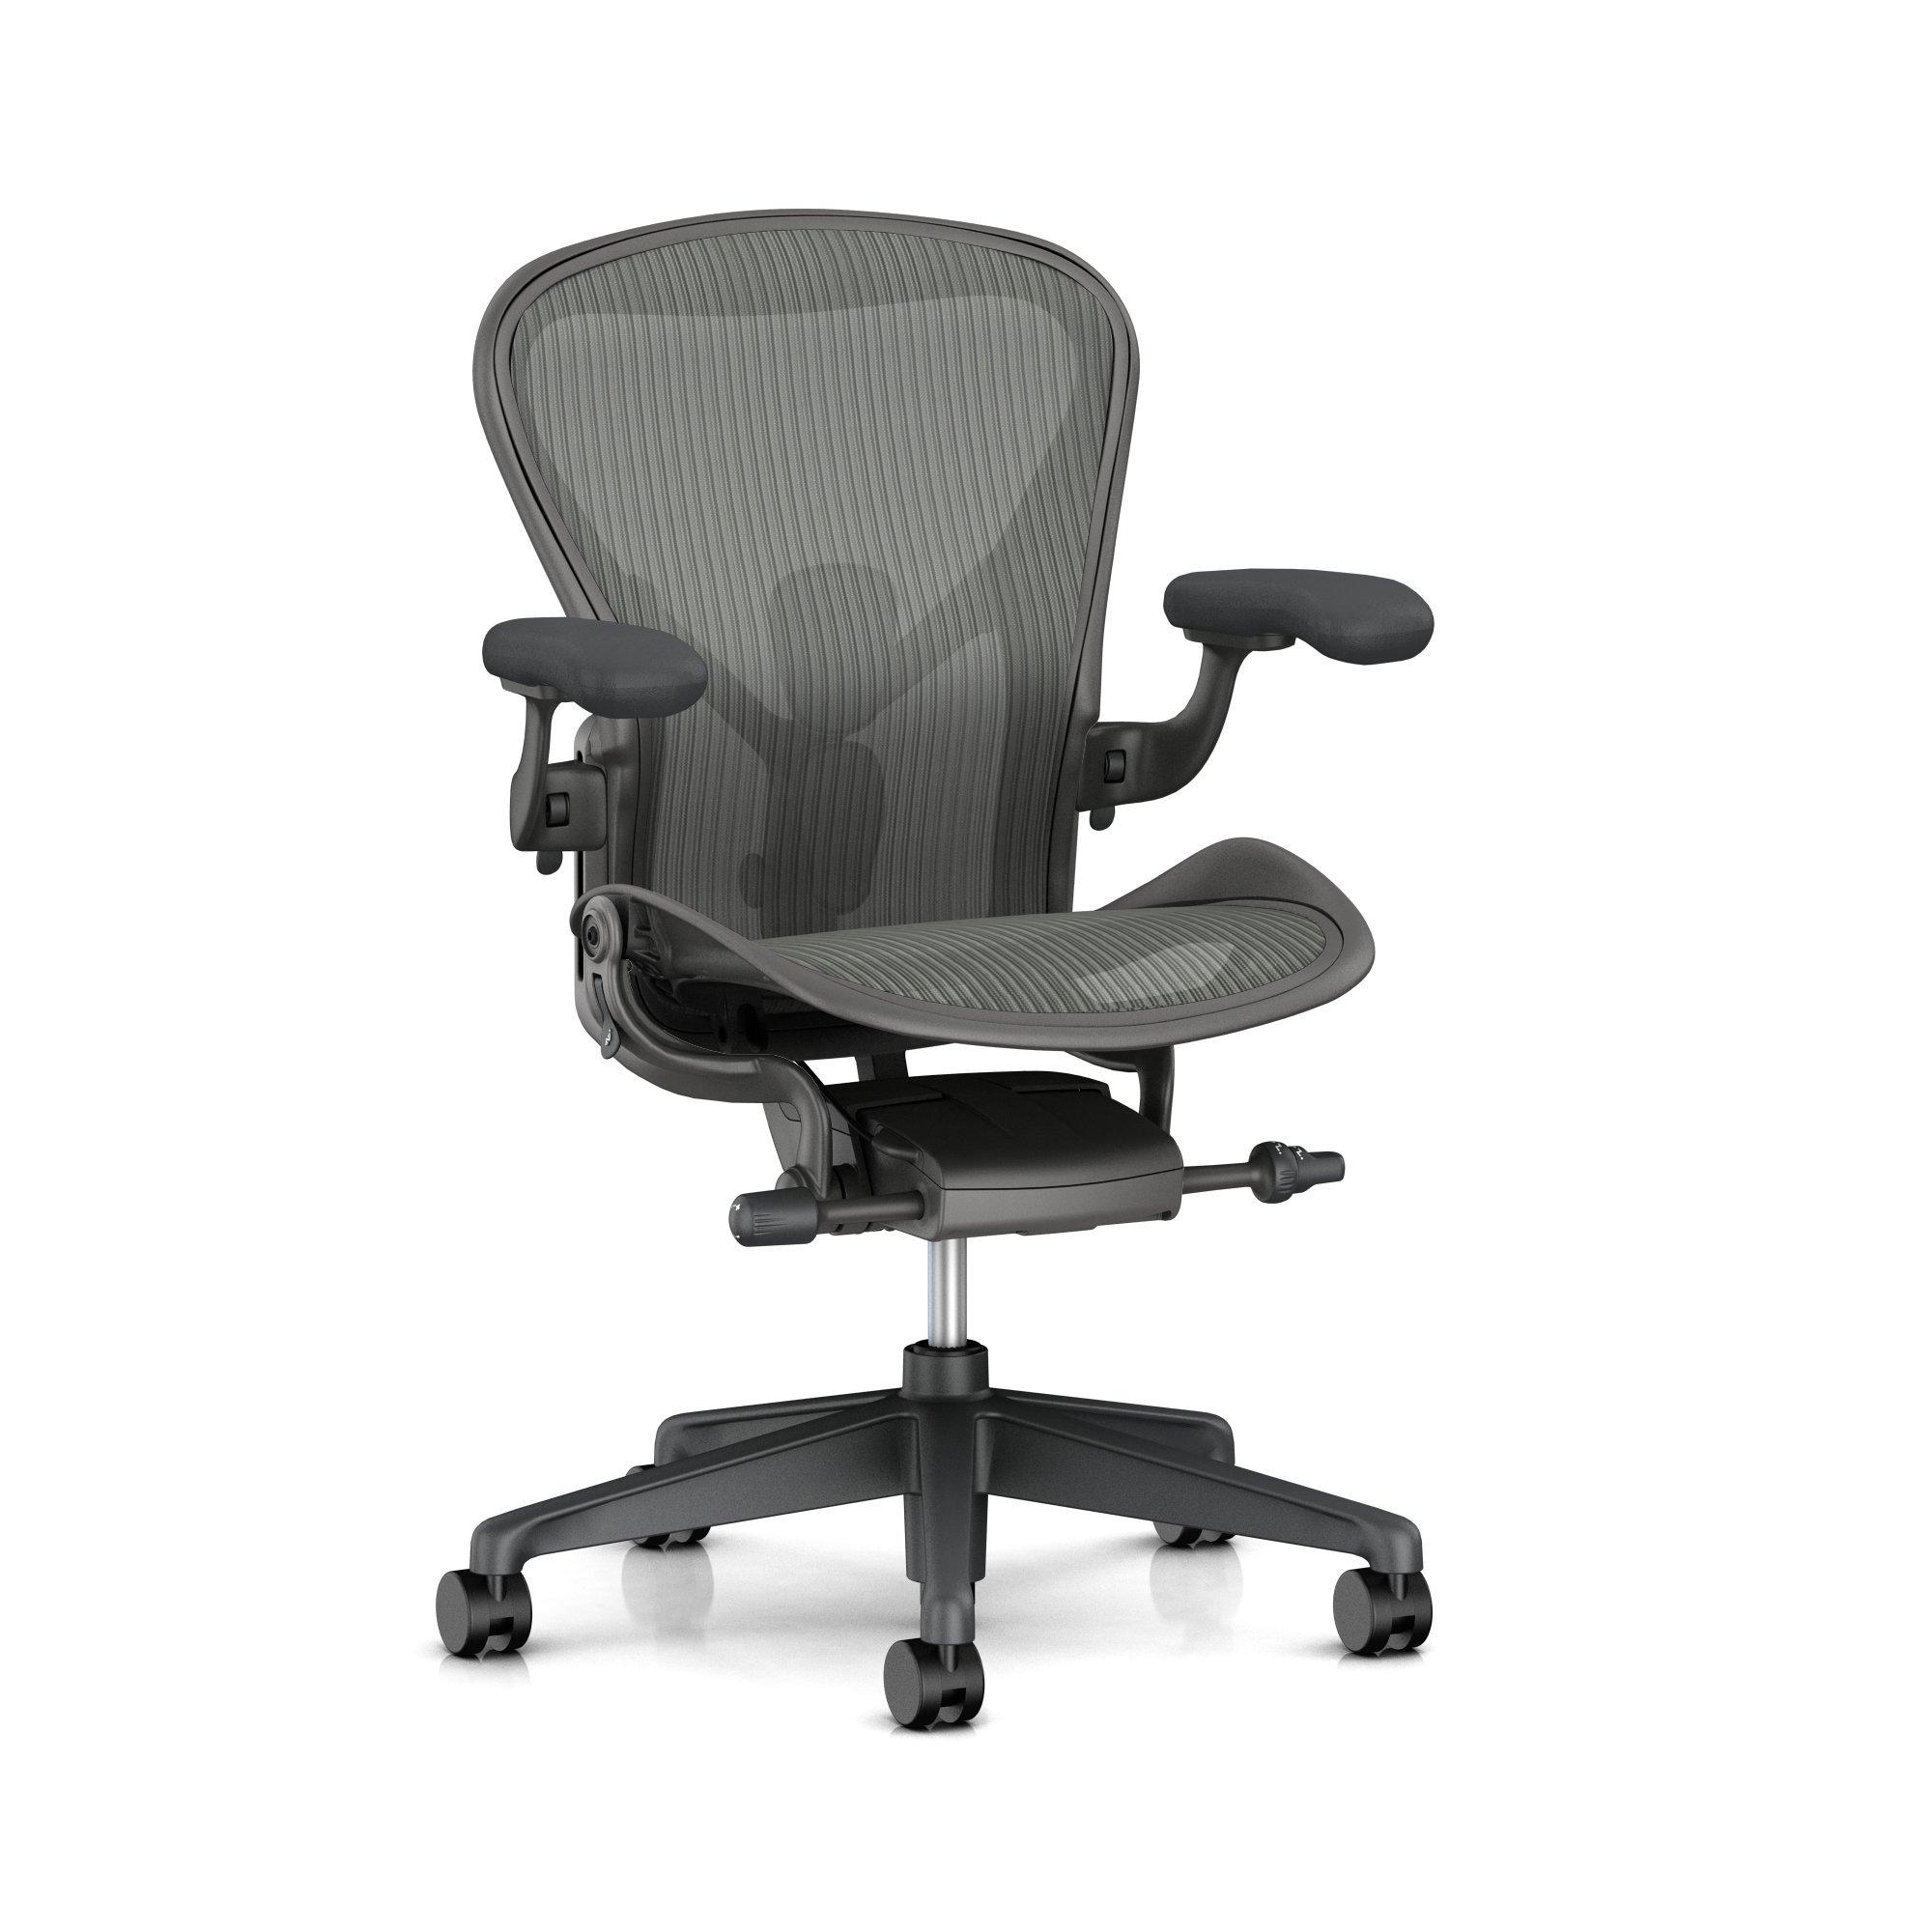 Herman Miller Aeron Task Chair: Tilt Limiter/Seat Angle - PostureFit SL - Fully Adj Arm + Armpad Depth - Dark Carbon Vinyl Armpad - Hard Floor Caster